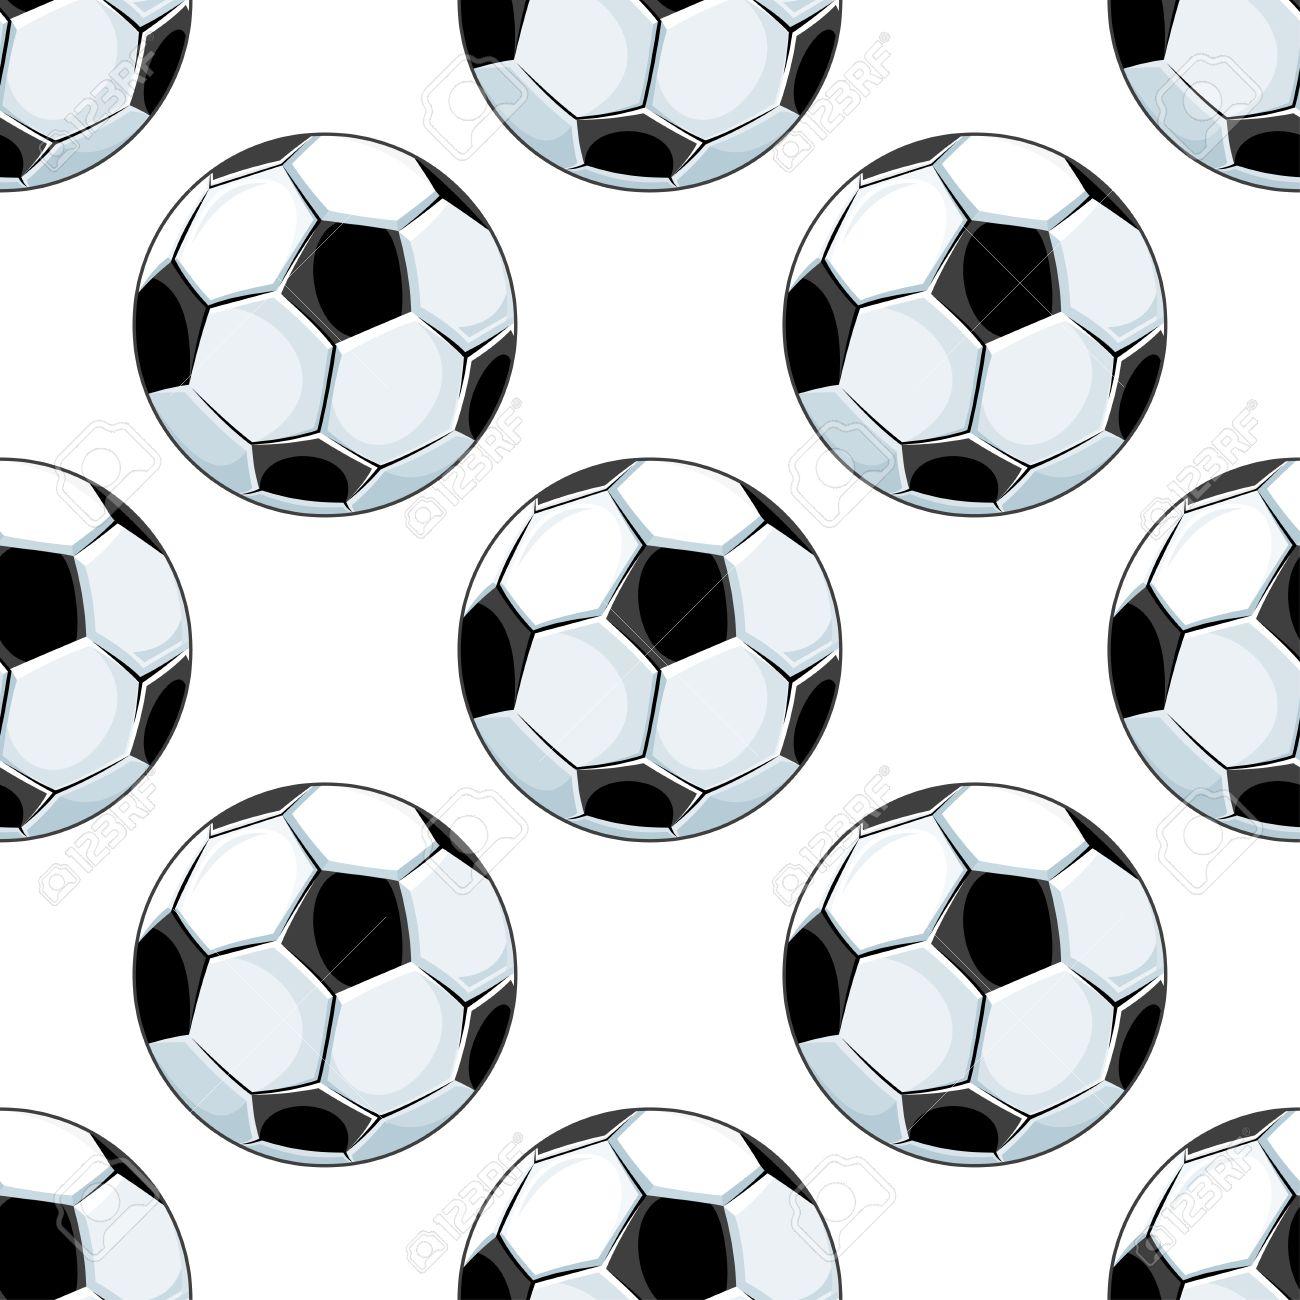 Fondos de pantalla de balones de futbol